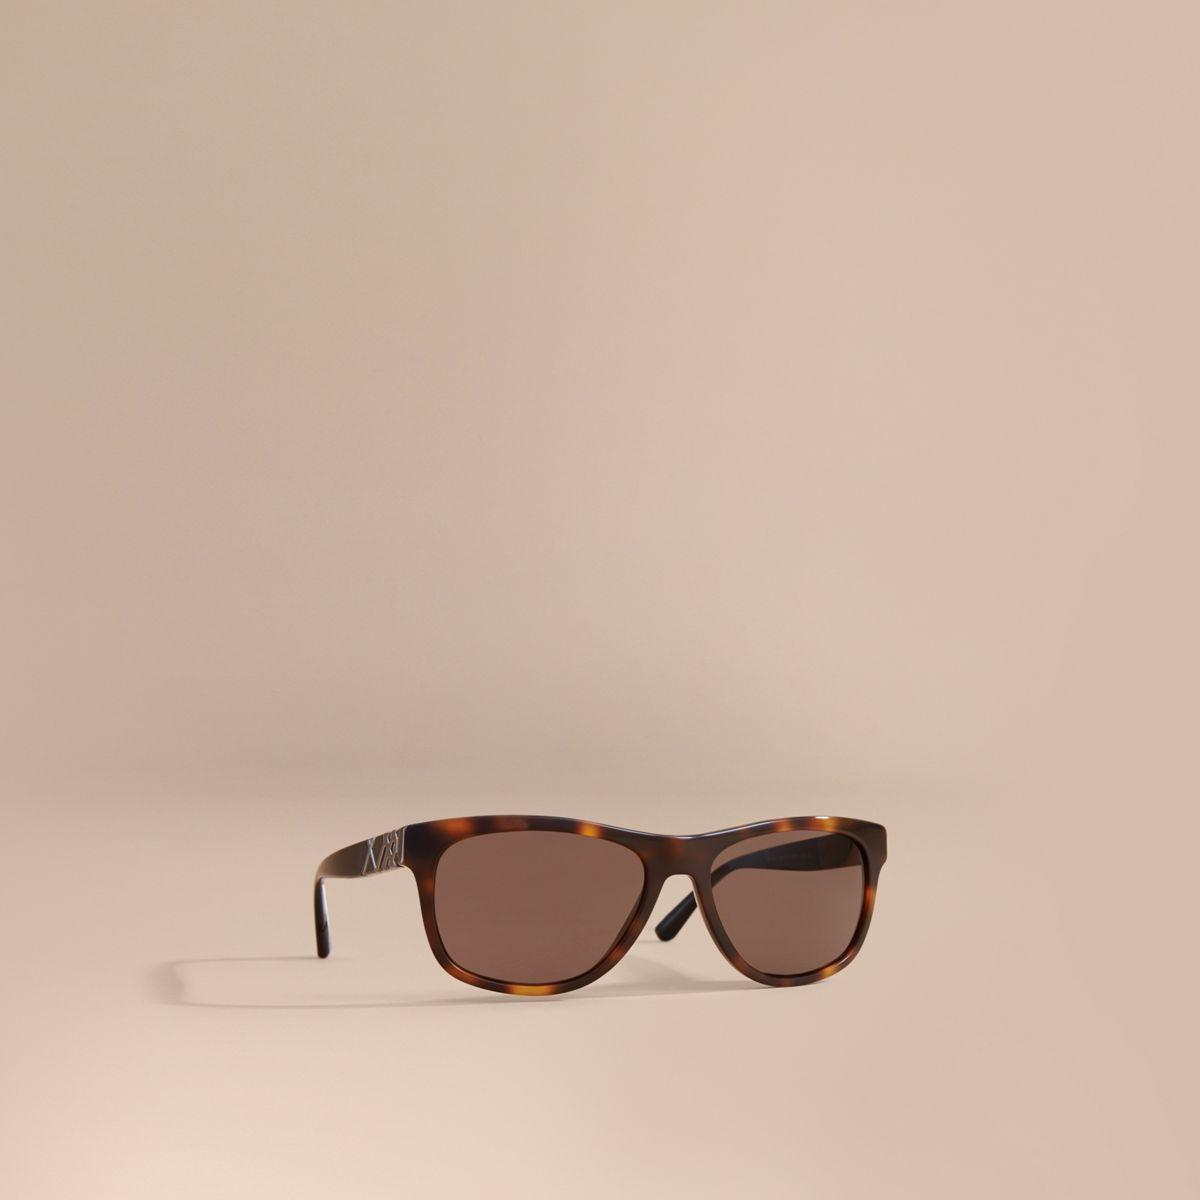 8b36bdc4dfa9 Burberry Check Detail Square Frame Sunglasses Tortoiseshell in Brown ...